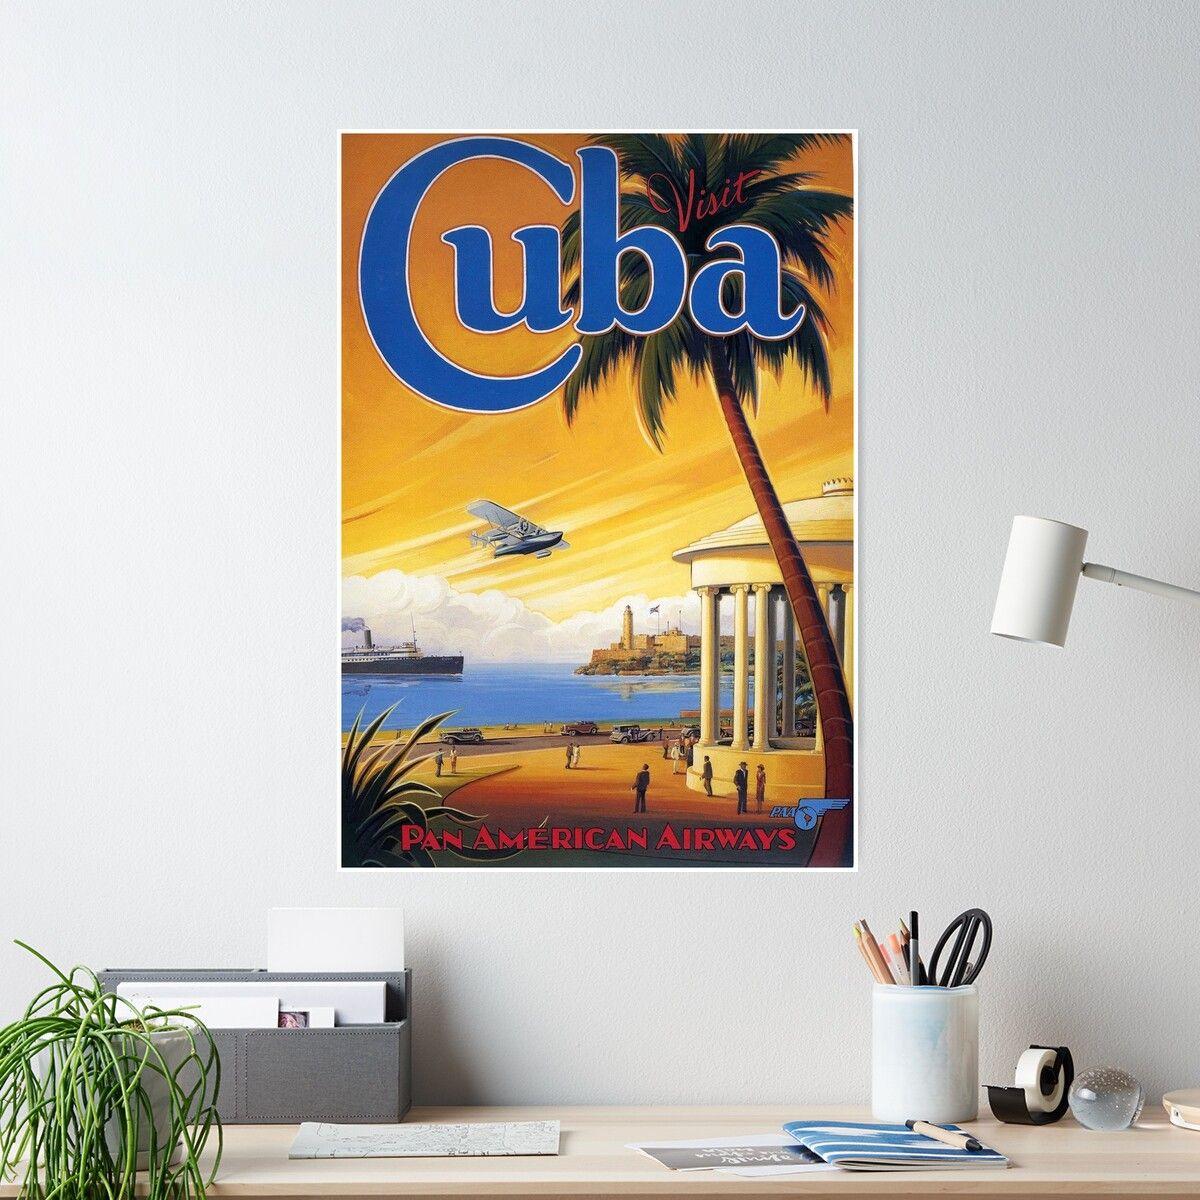 'Visit Cuba Pan American Airlines Vintage Travel Poster' Poster by Framerkat #visitcuba